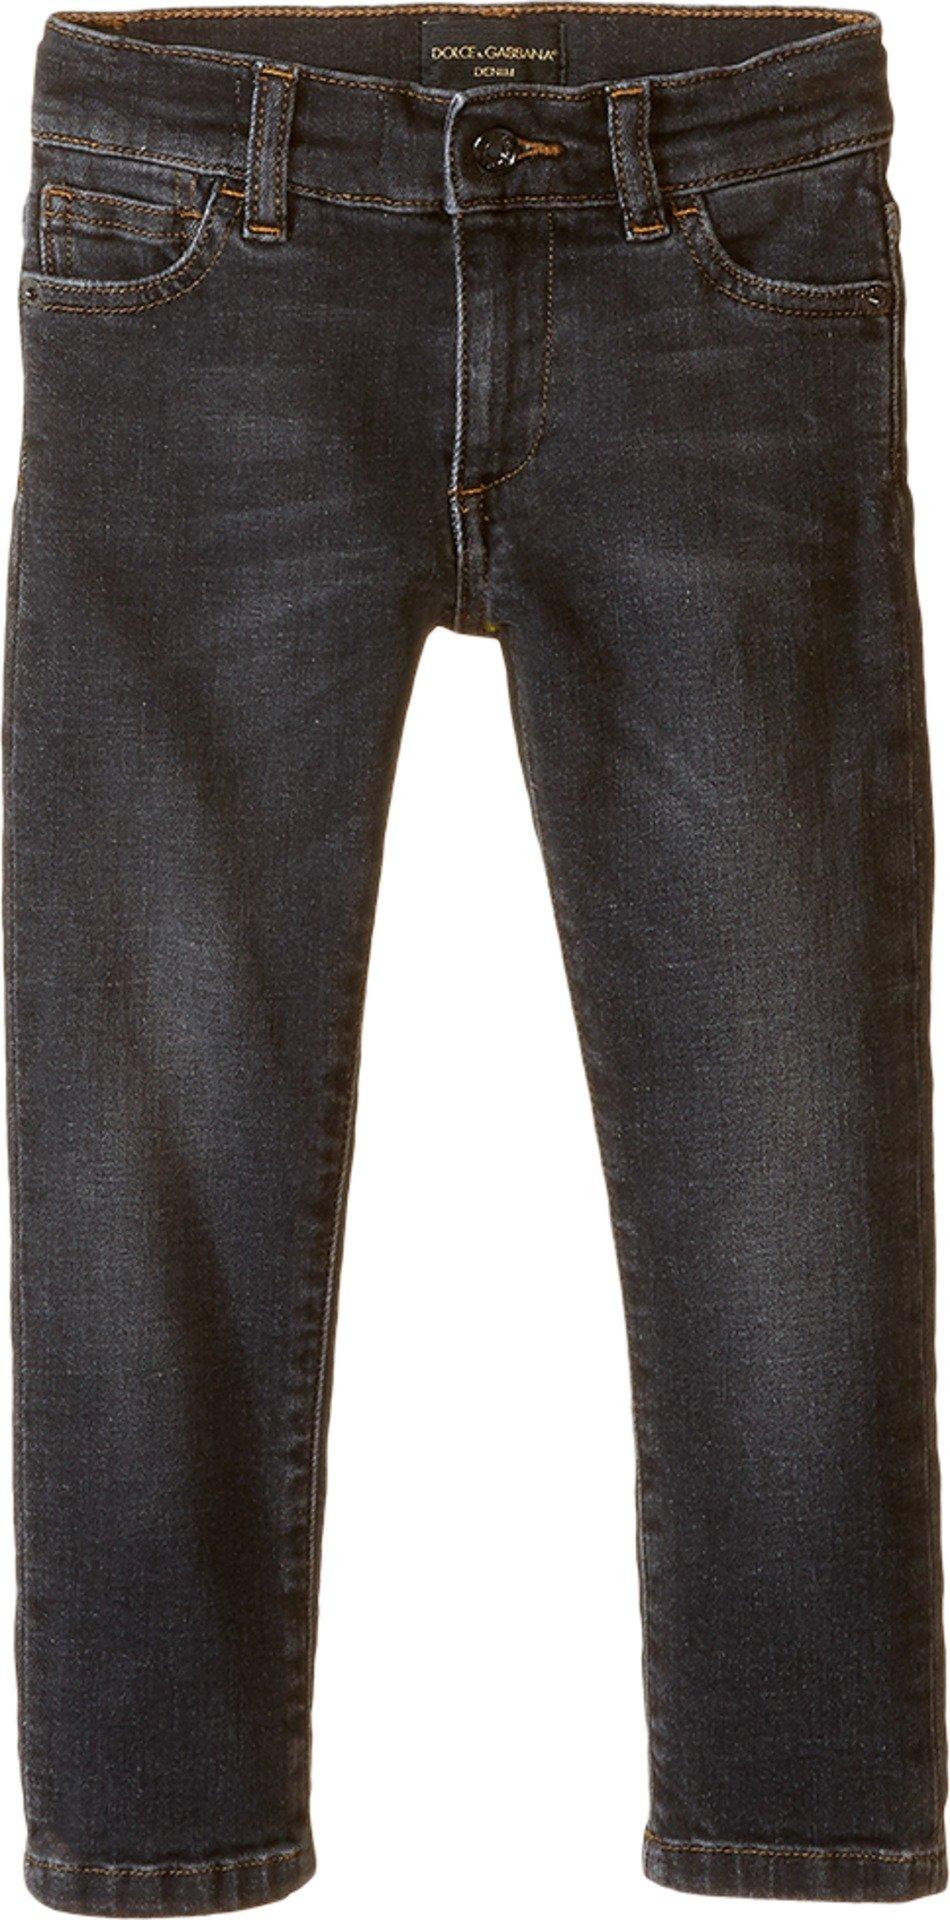 Dolce & Gabbana Kids Boys' Back To School Jeans (Little Kids), Grey Denim, 2T (Toddler) X One Size by Dolce & Gabbana